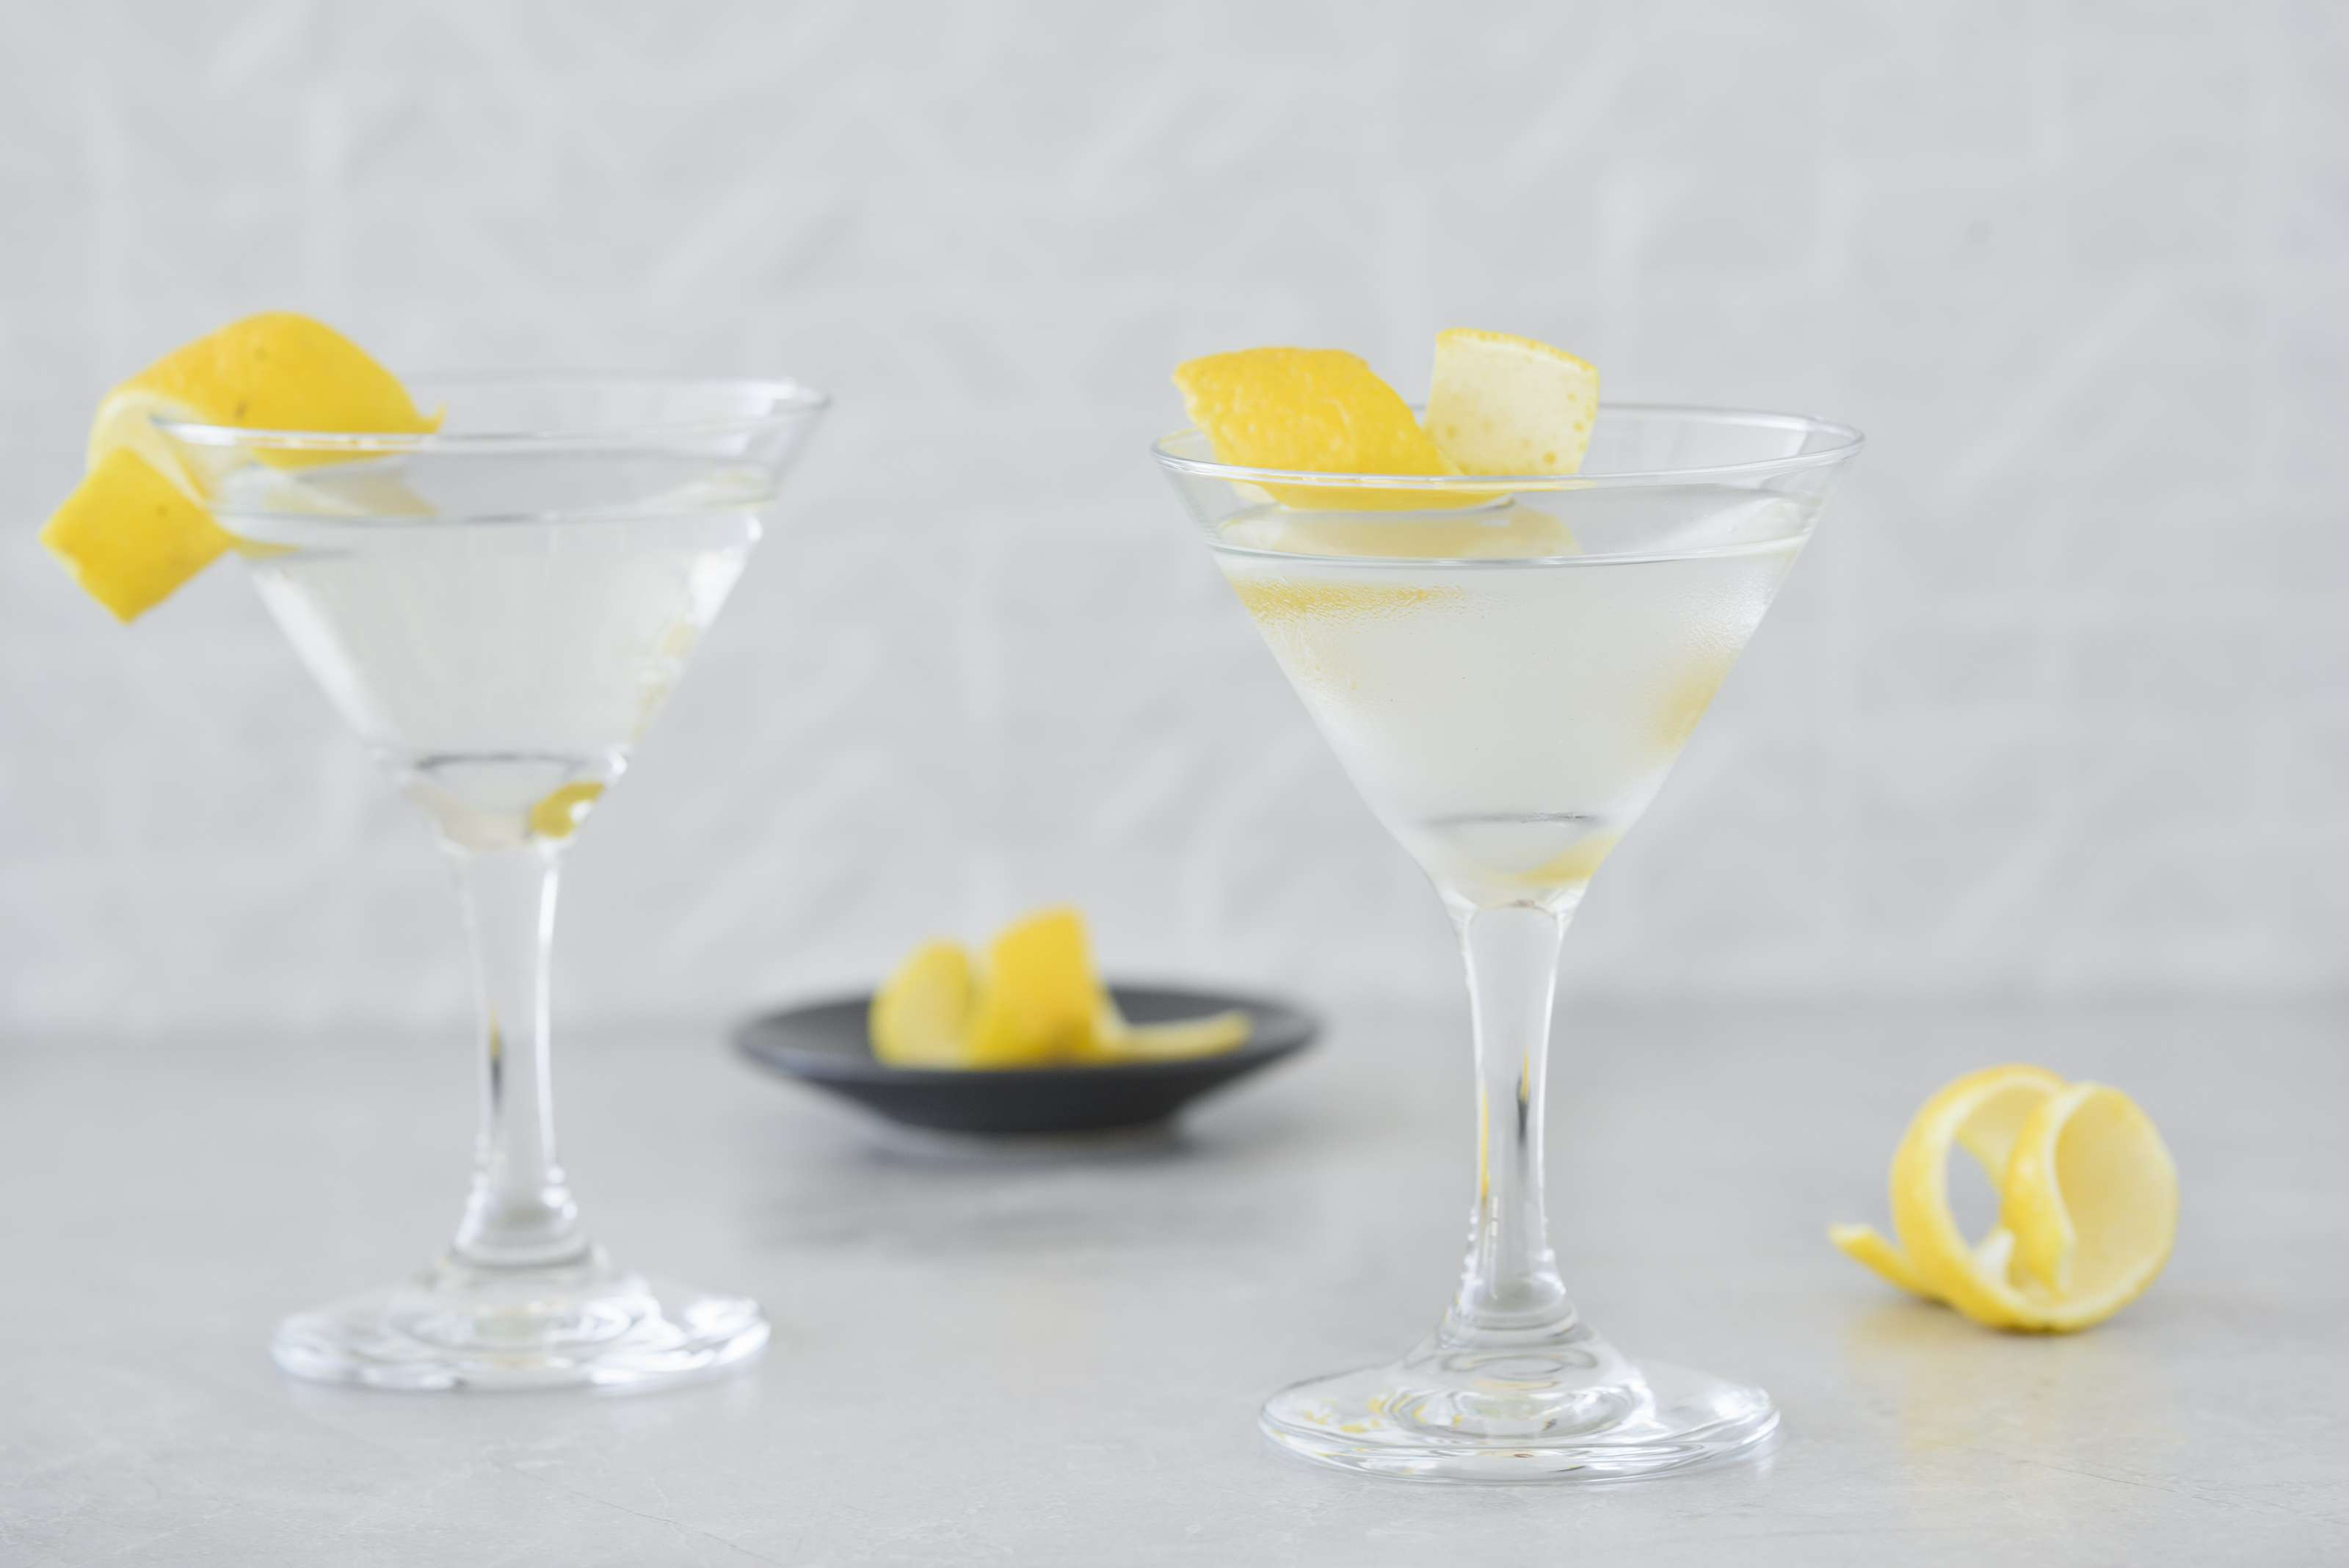 Classic Gin Martini - Garnish with lemon